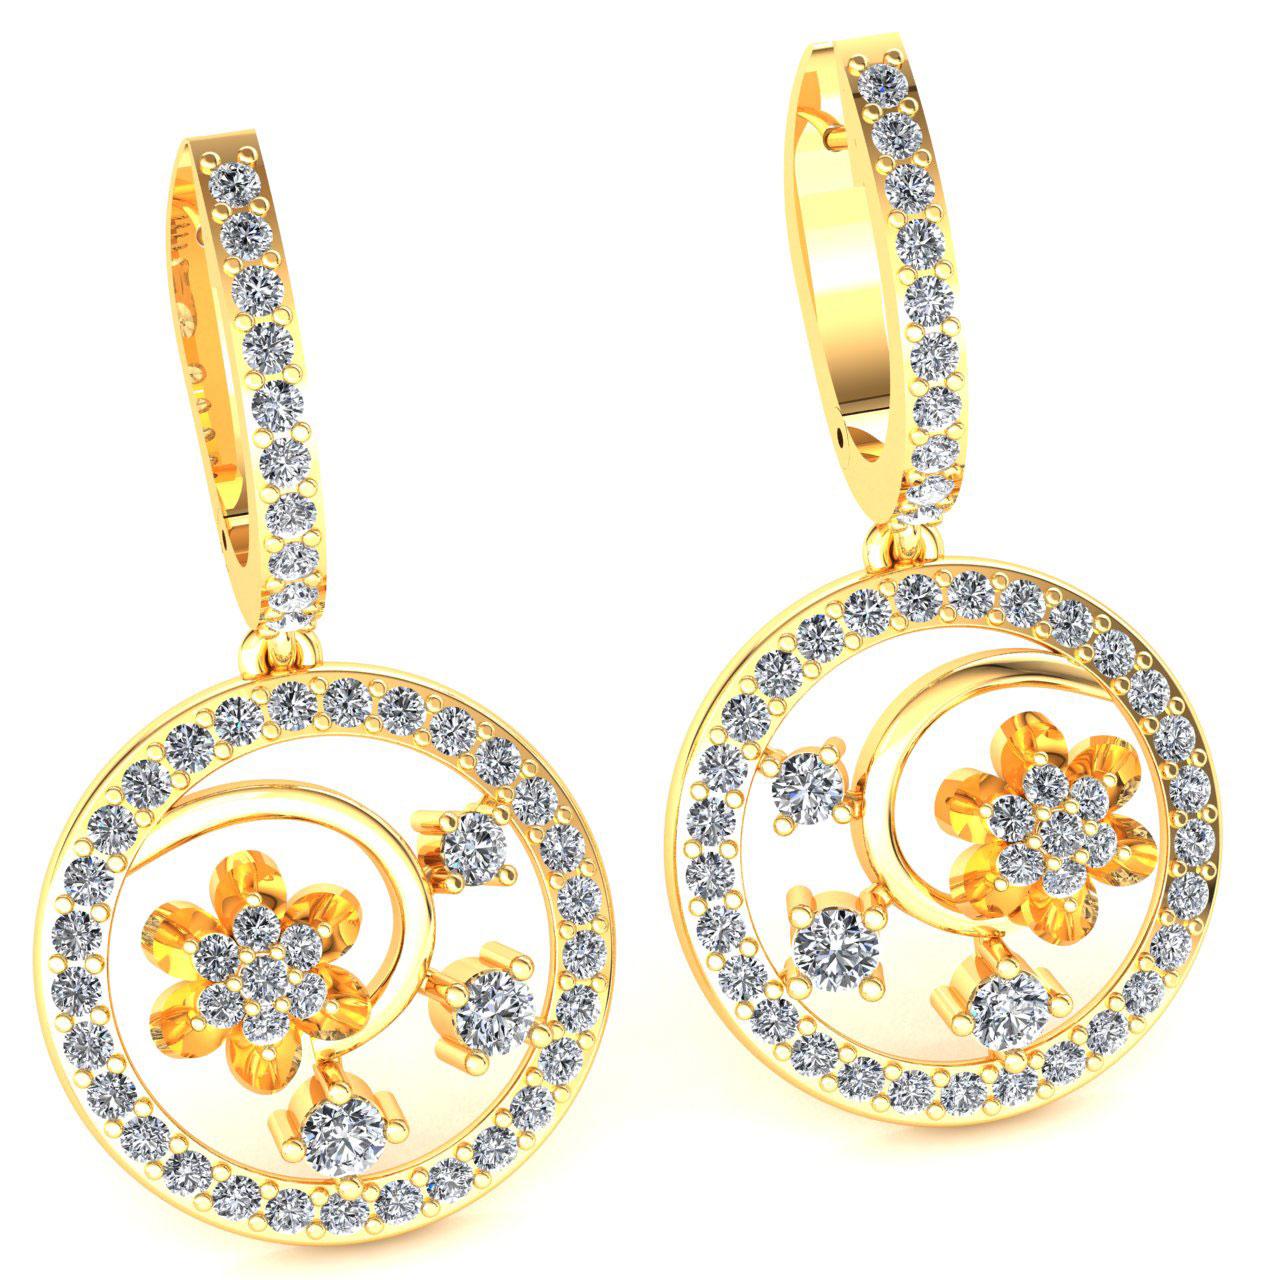 Genuine-1-15carat-Round-Cut-Diamond-Ladies-Flower-Circles-Earrings-14K-Gold thumbnail 12